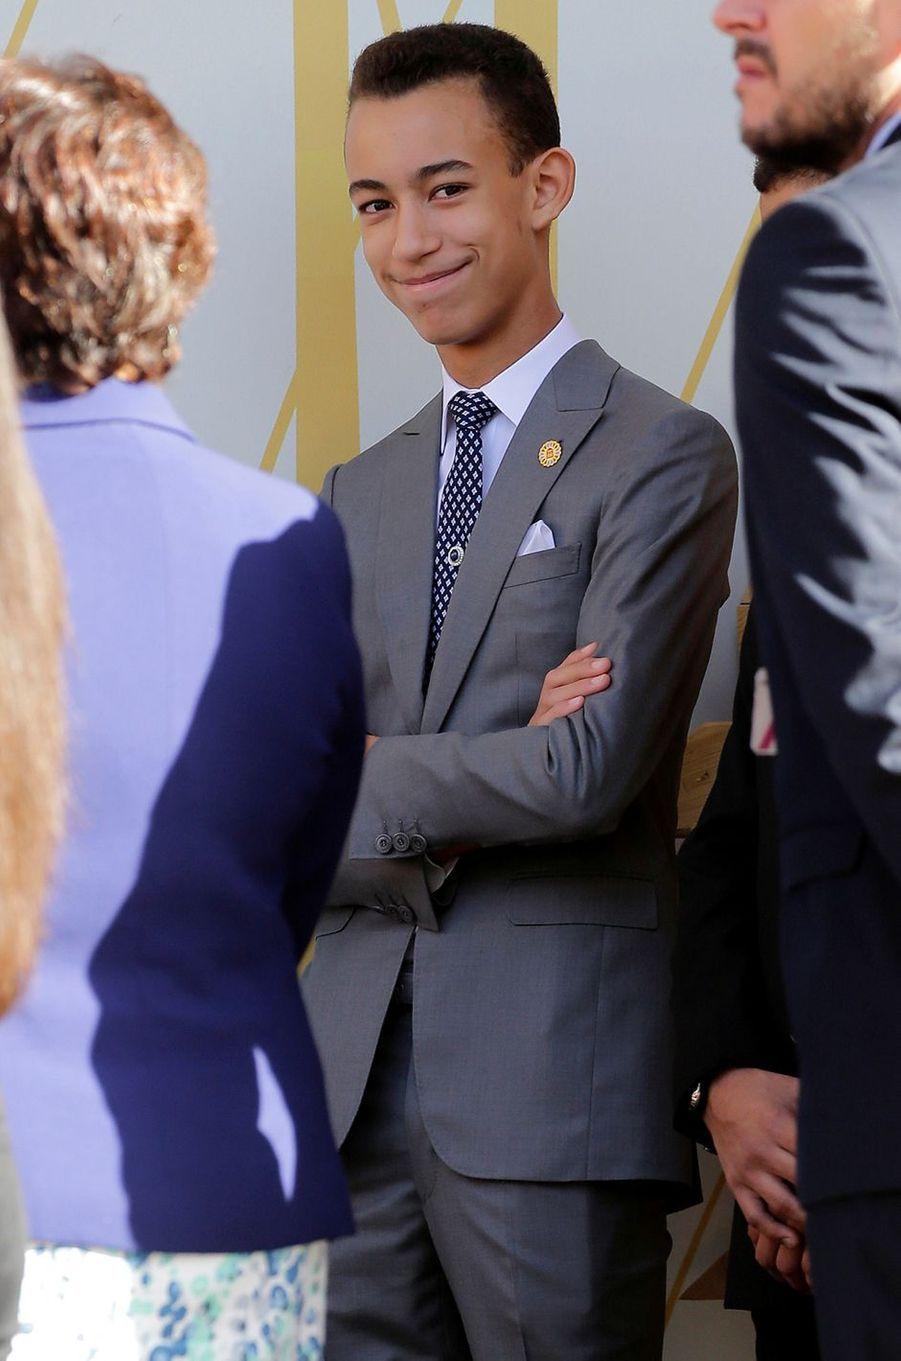 Le prince héritier Moulay El Hassan du Maroc, le 17 novembre 2016